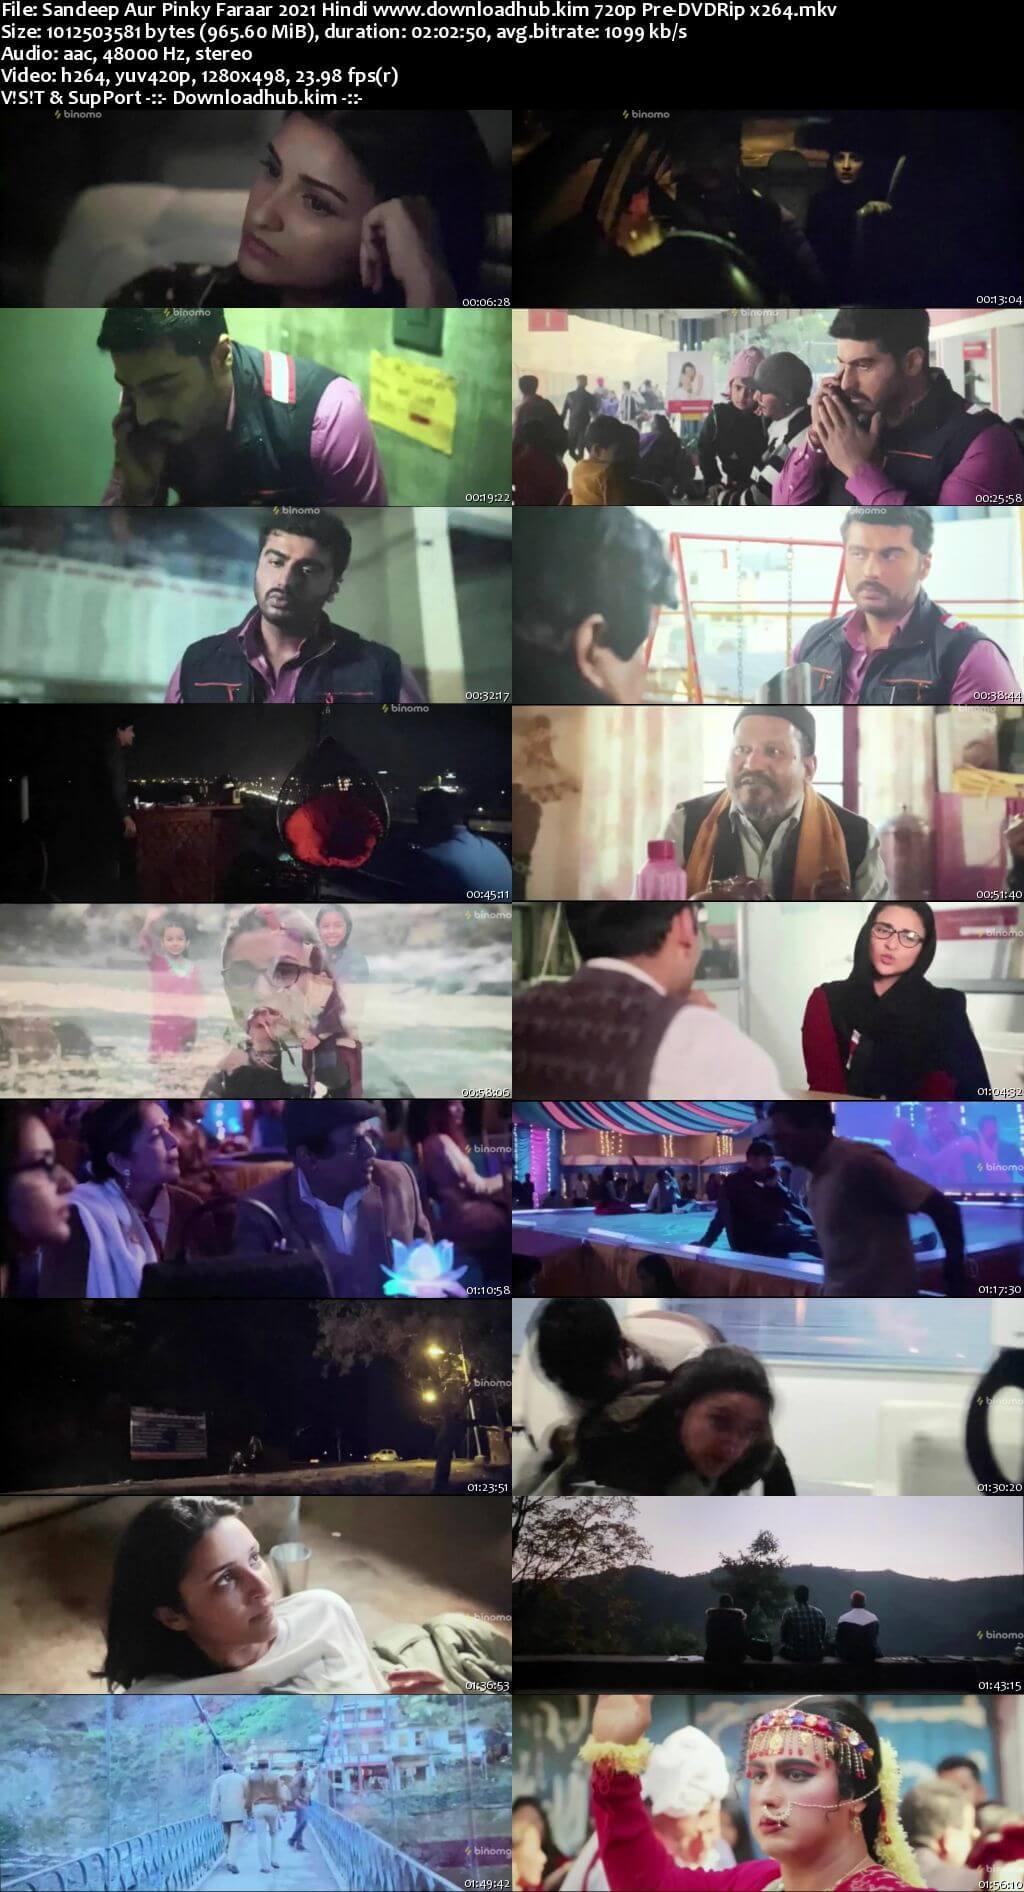 Sandeep Aur Pinky Faraar 2021 Hindi 720p 480p Pre-DVDRip x264